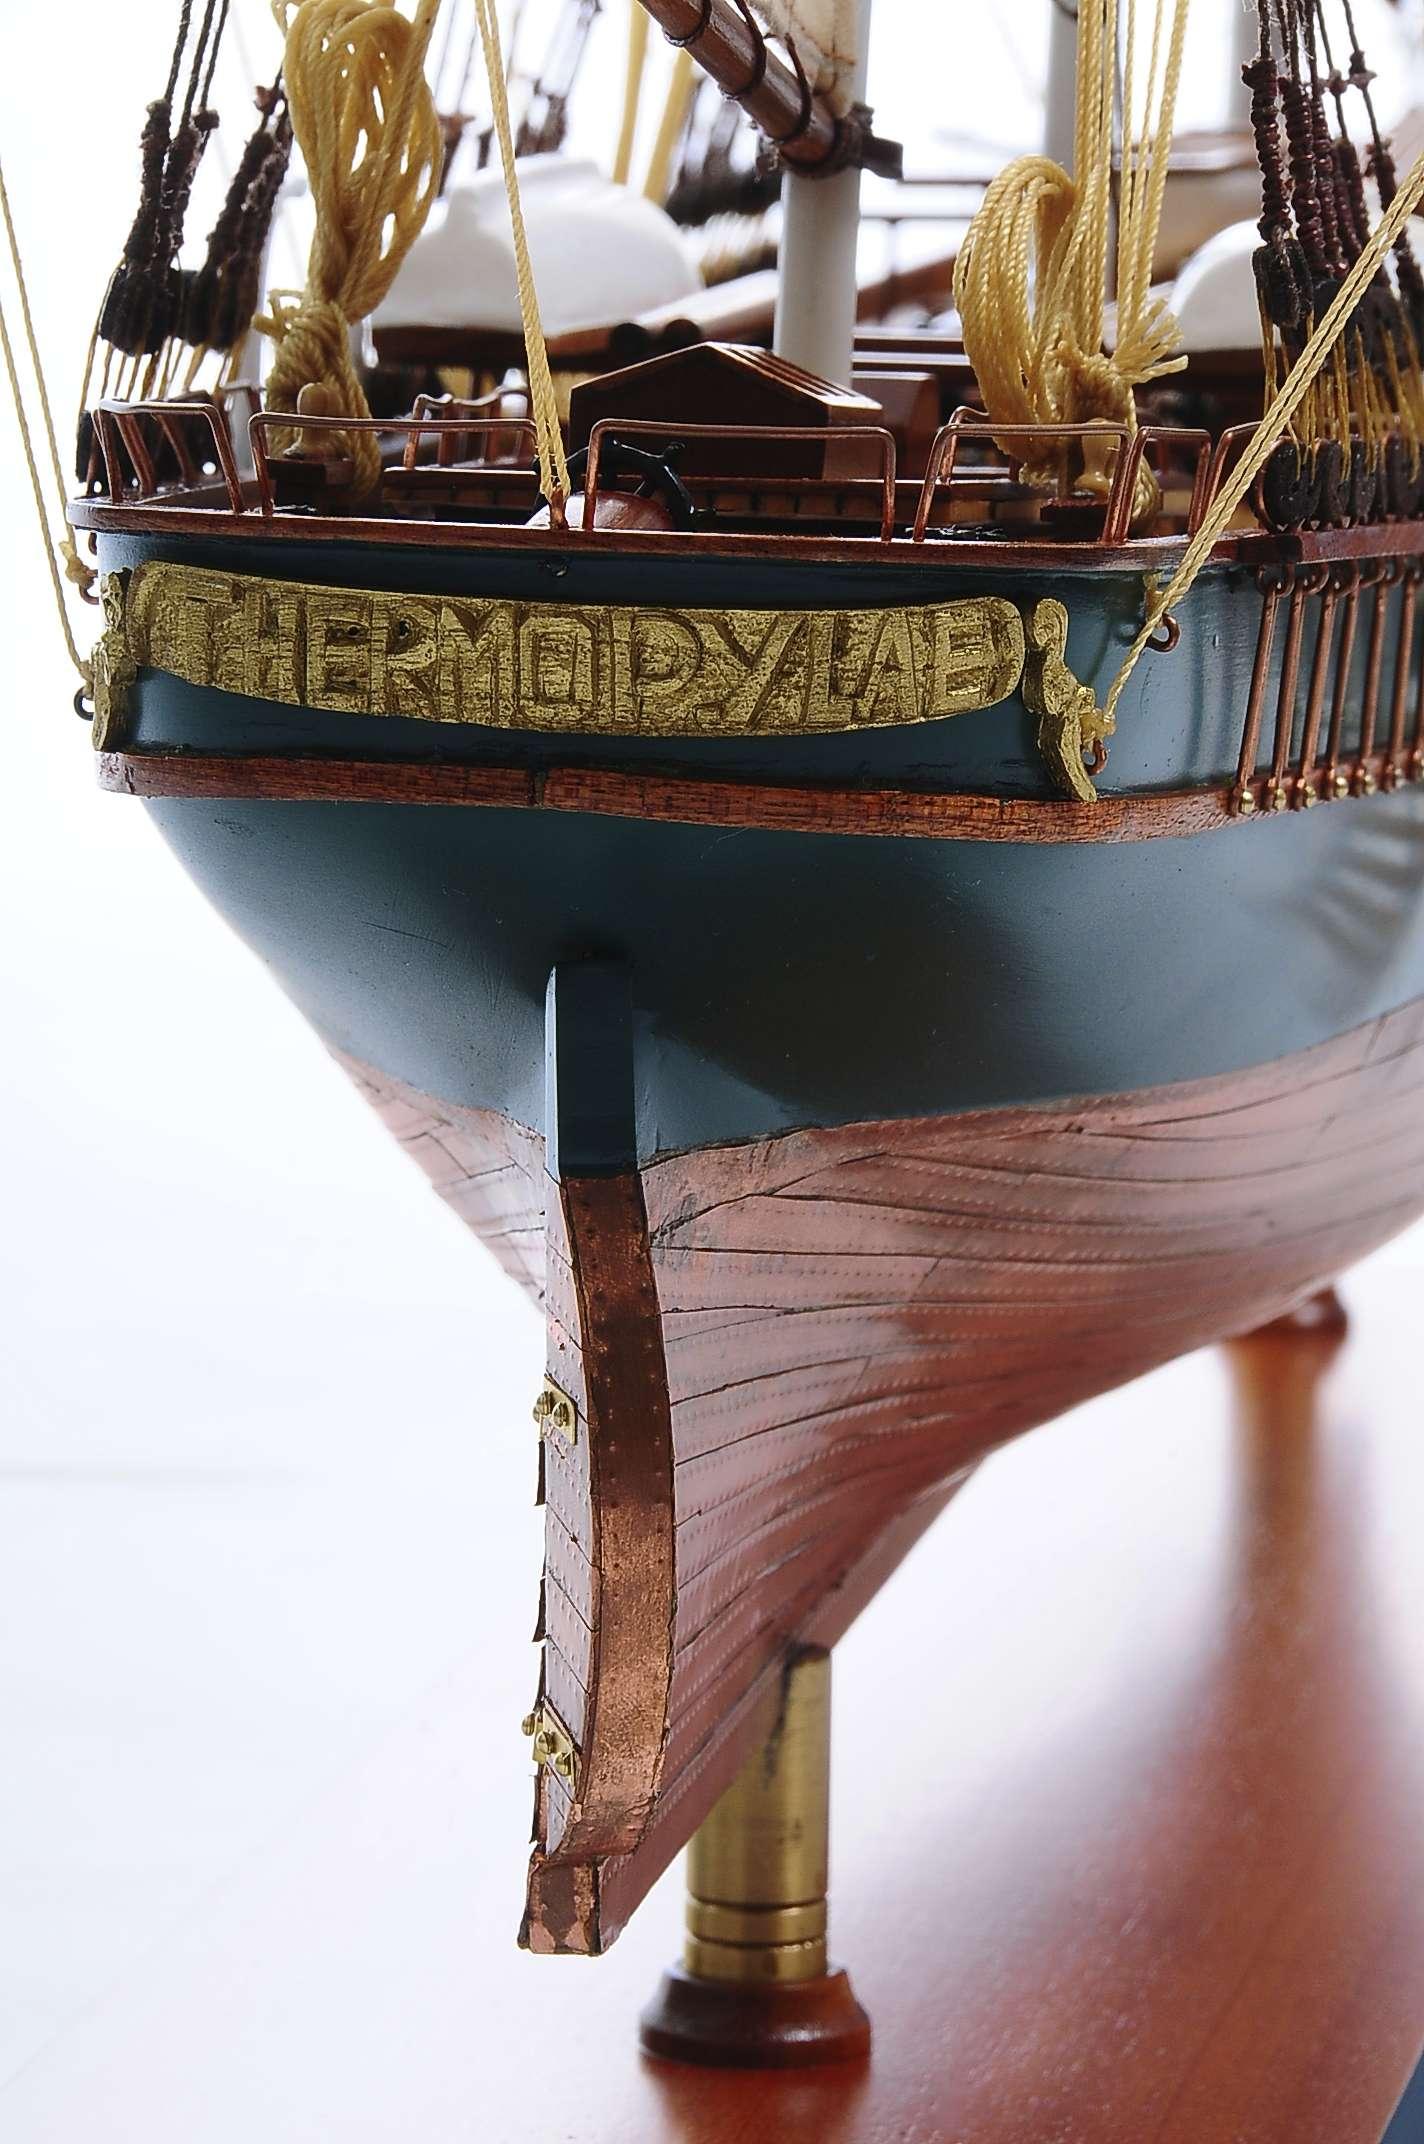 1434-4862-Thermopylae-Model-Boat